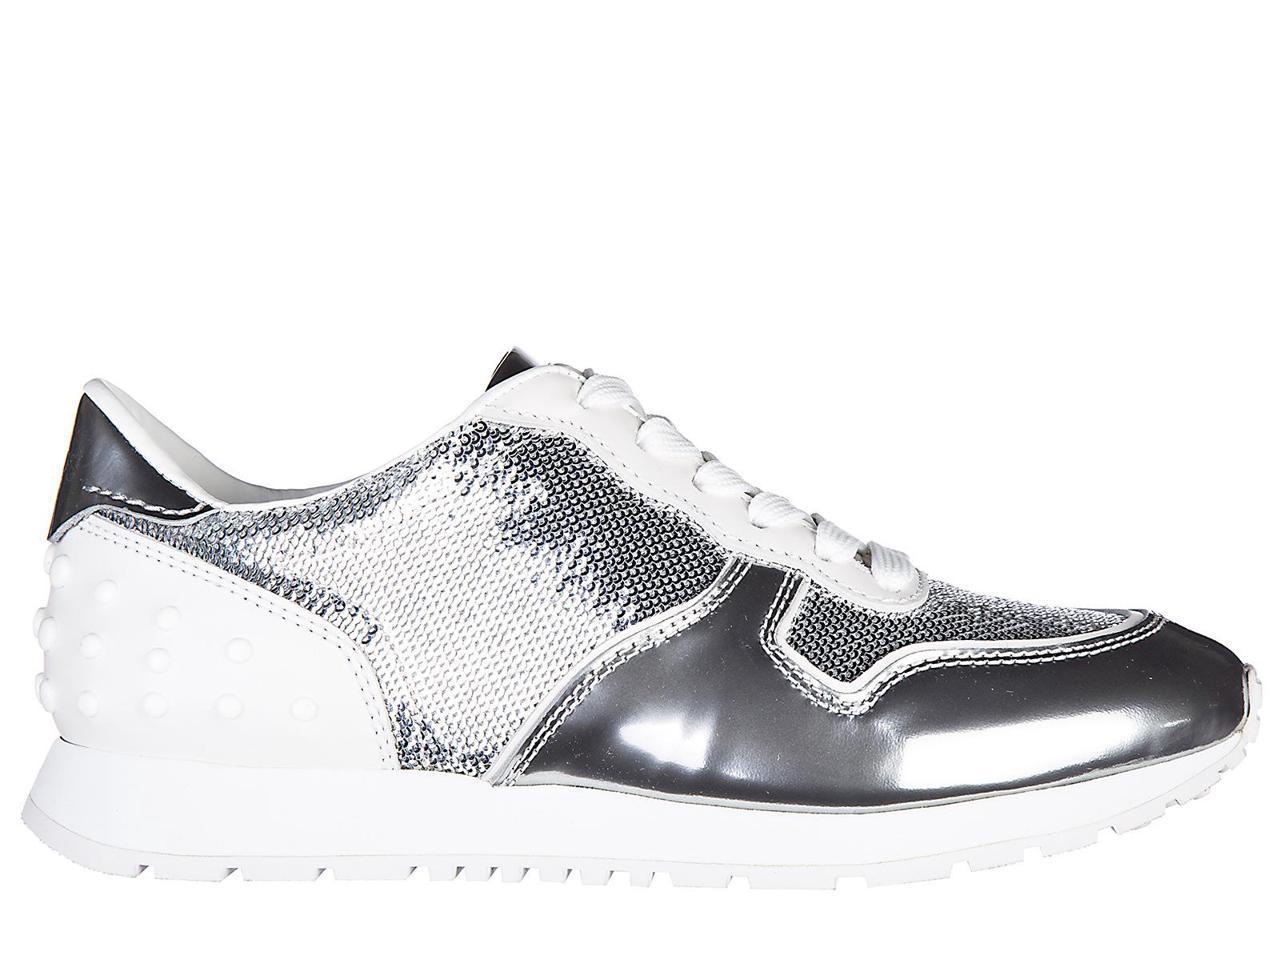 Tod's women's shoes leather allccaiata trainers sneakers nuove sportivo allccaiata leather silver 5c6dd2